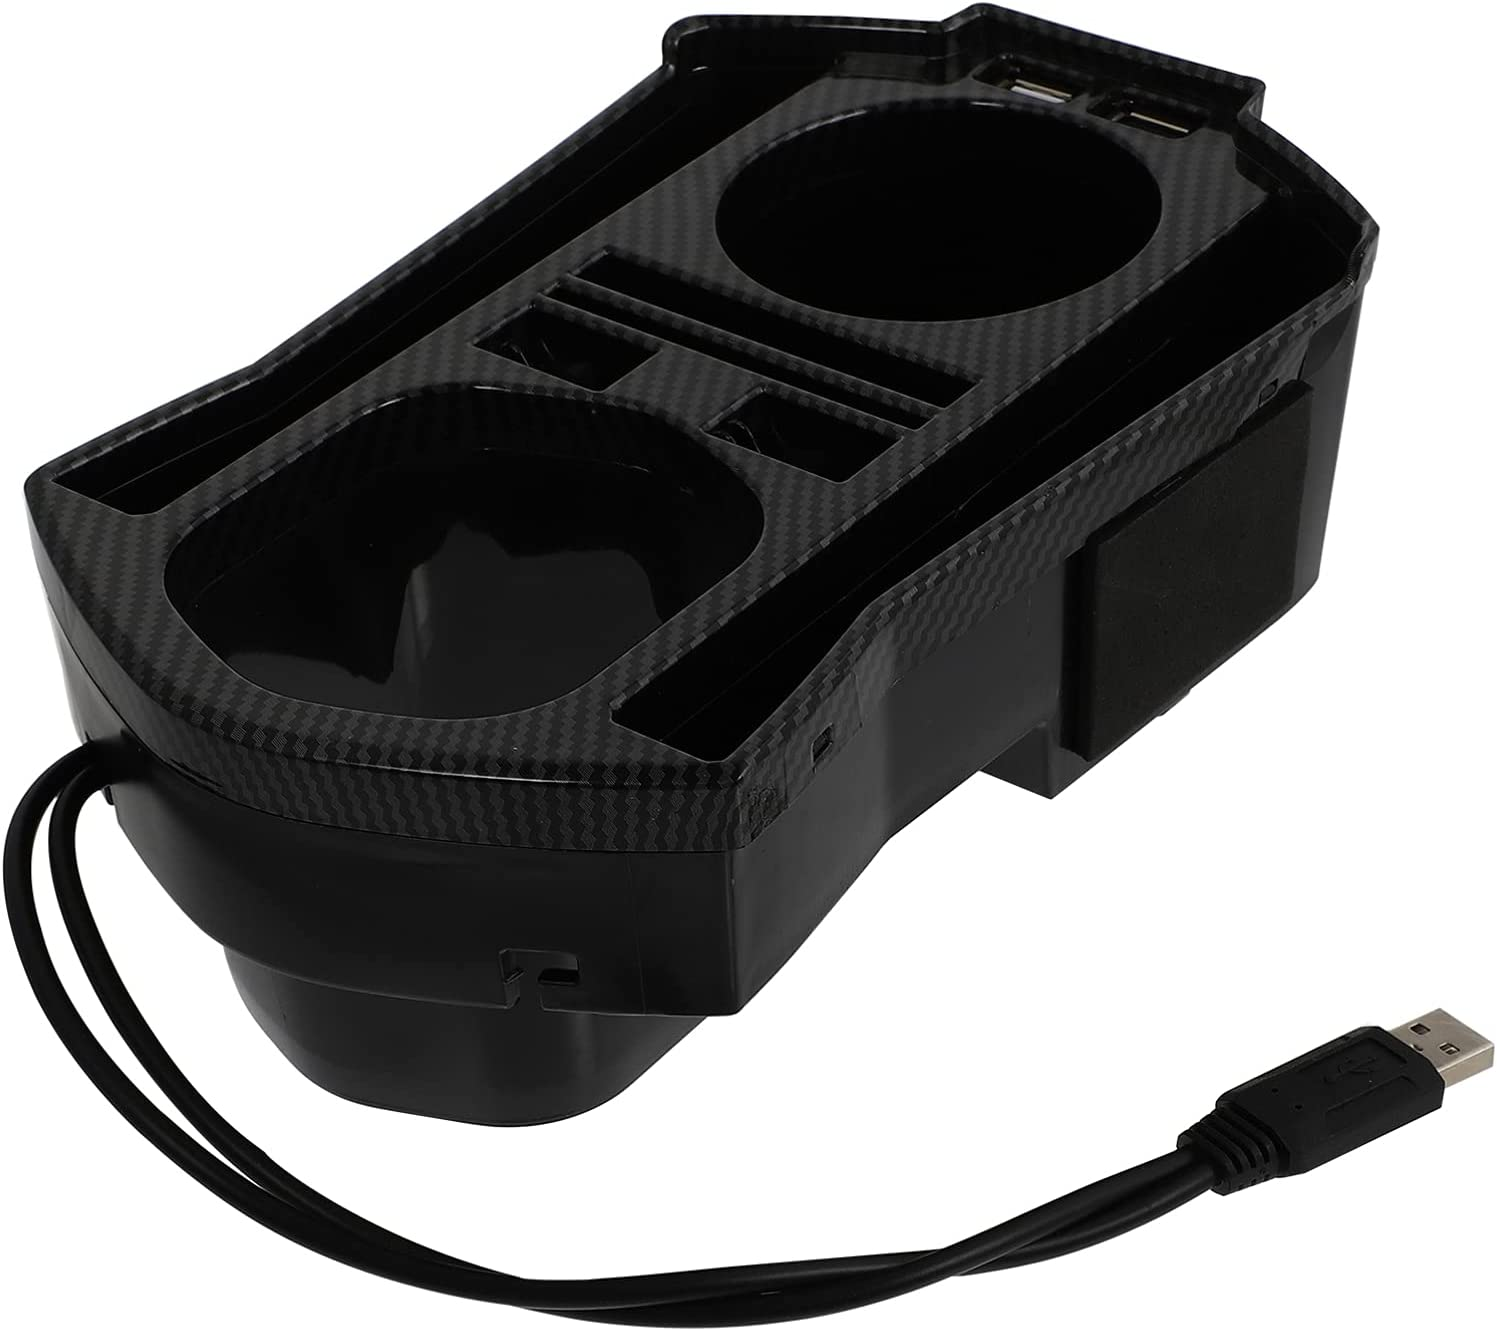 FAVOMOTO Auto Max 56% OFF Console Box Center Cup 2021 autumn and winter new Car C Rack Interior